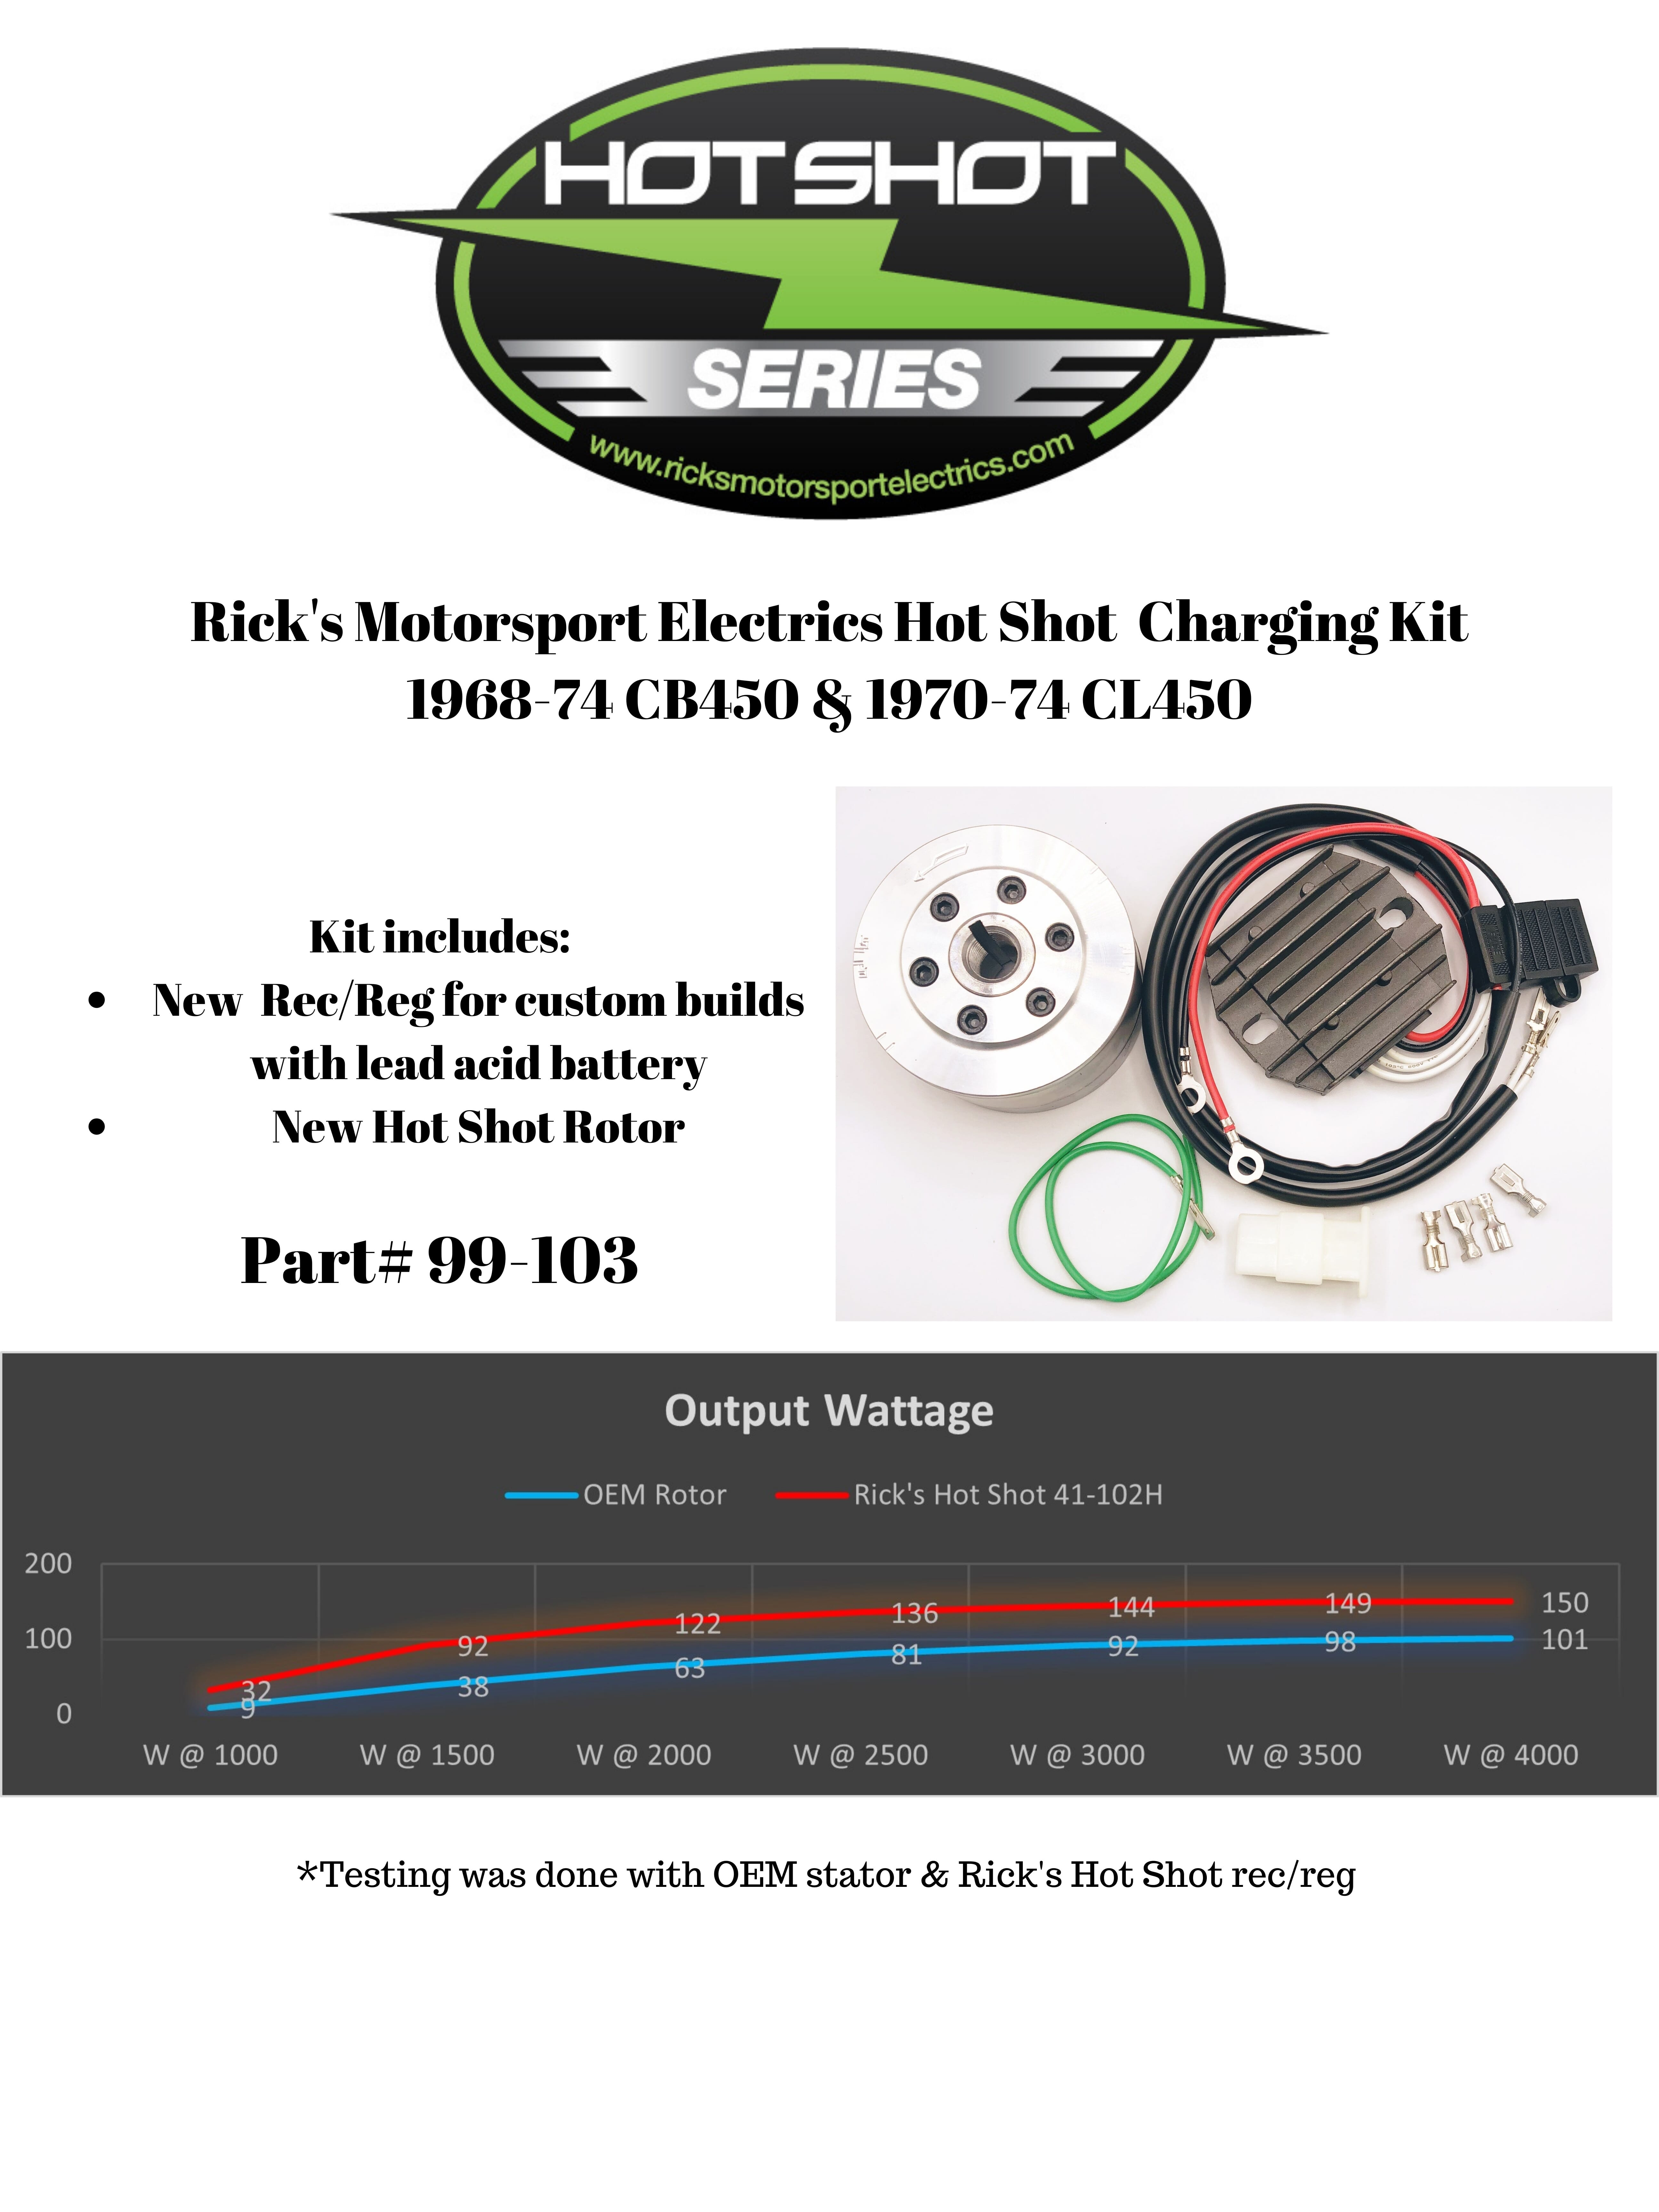 New Honda Charging Kit 99_103